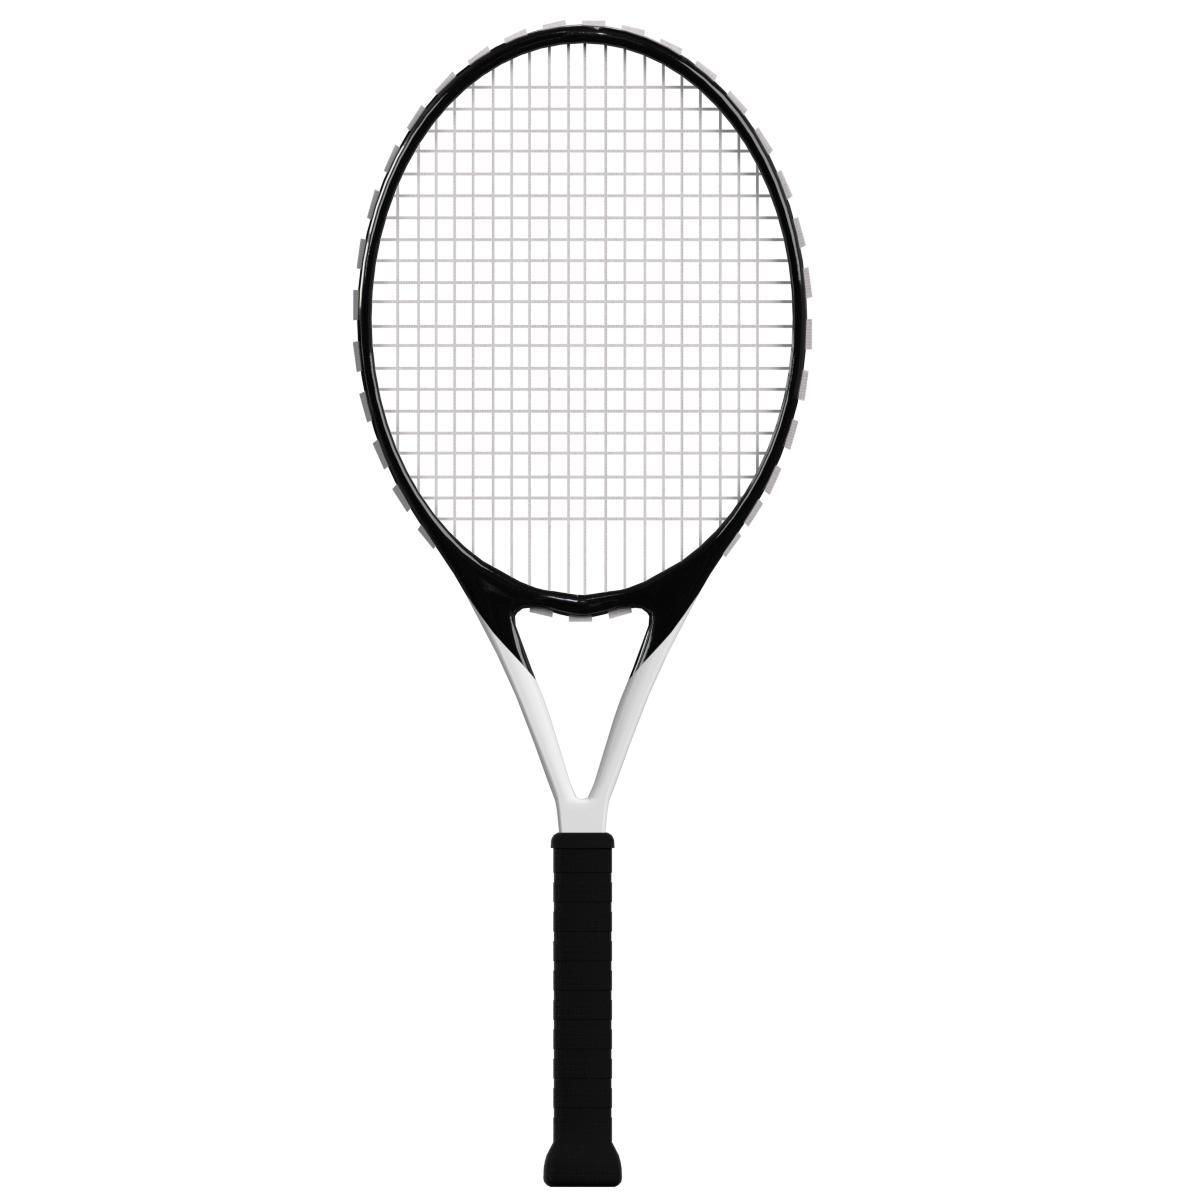 Tennis Racket 2 By Francescomilanese 3docean